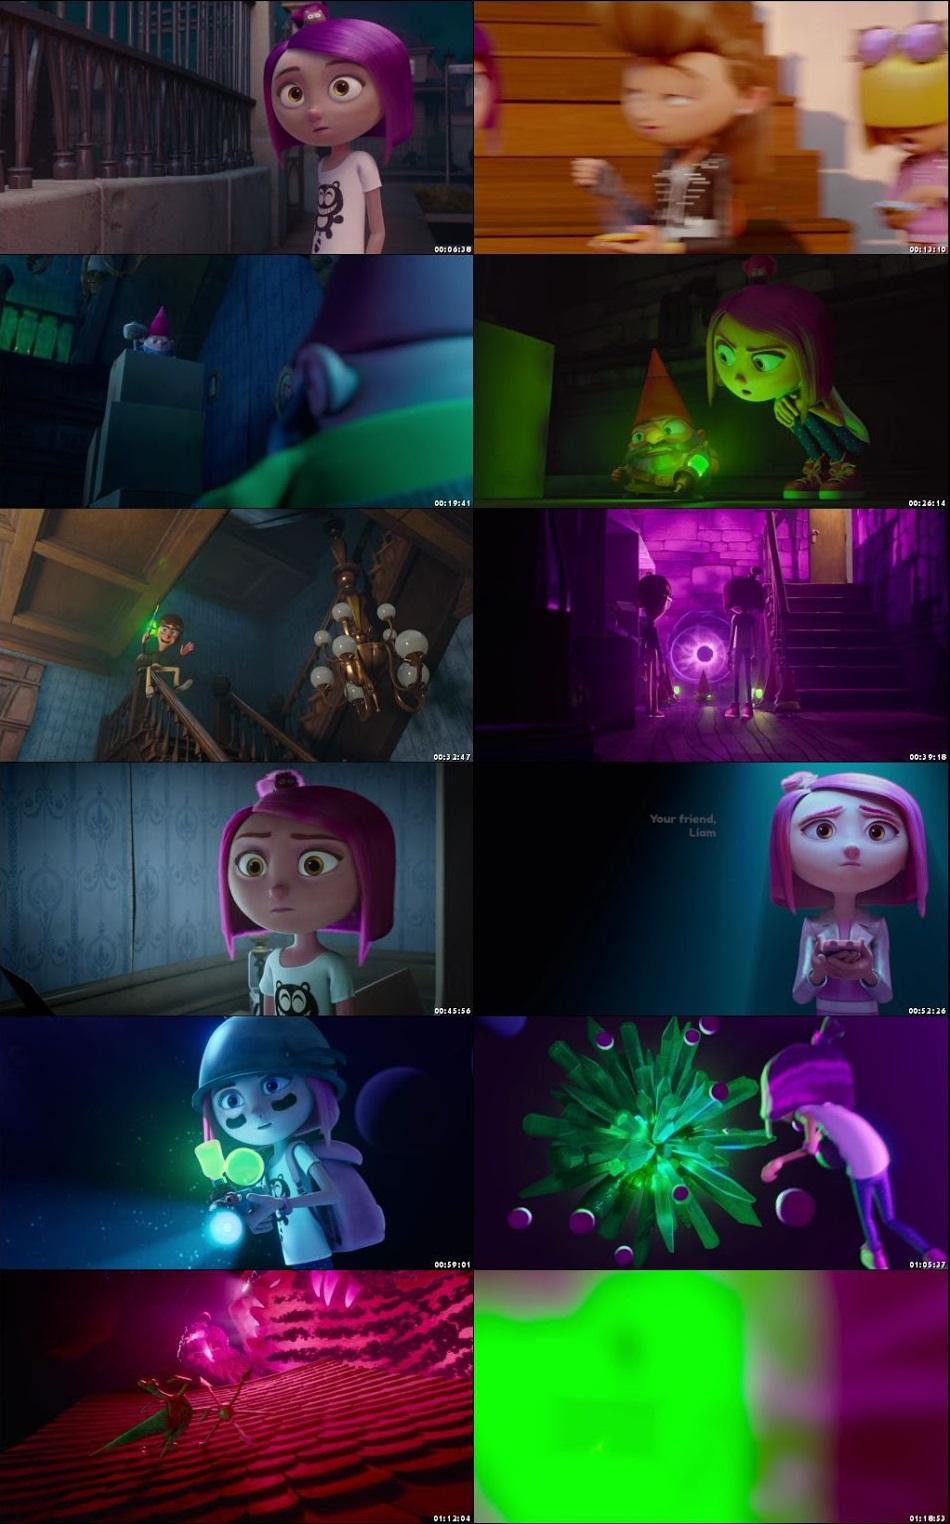 Gnome Alone 2017 Full Movie Download 720p HDRip, BluRay, DVDRip, mkv, Mp4 1080p Full Hd